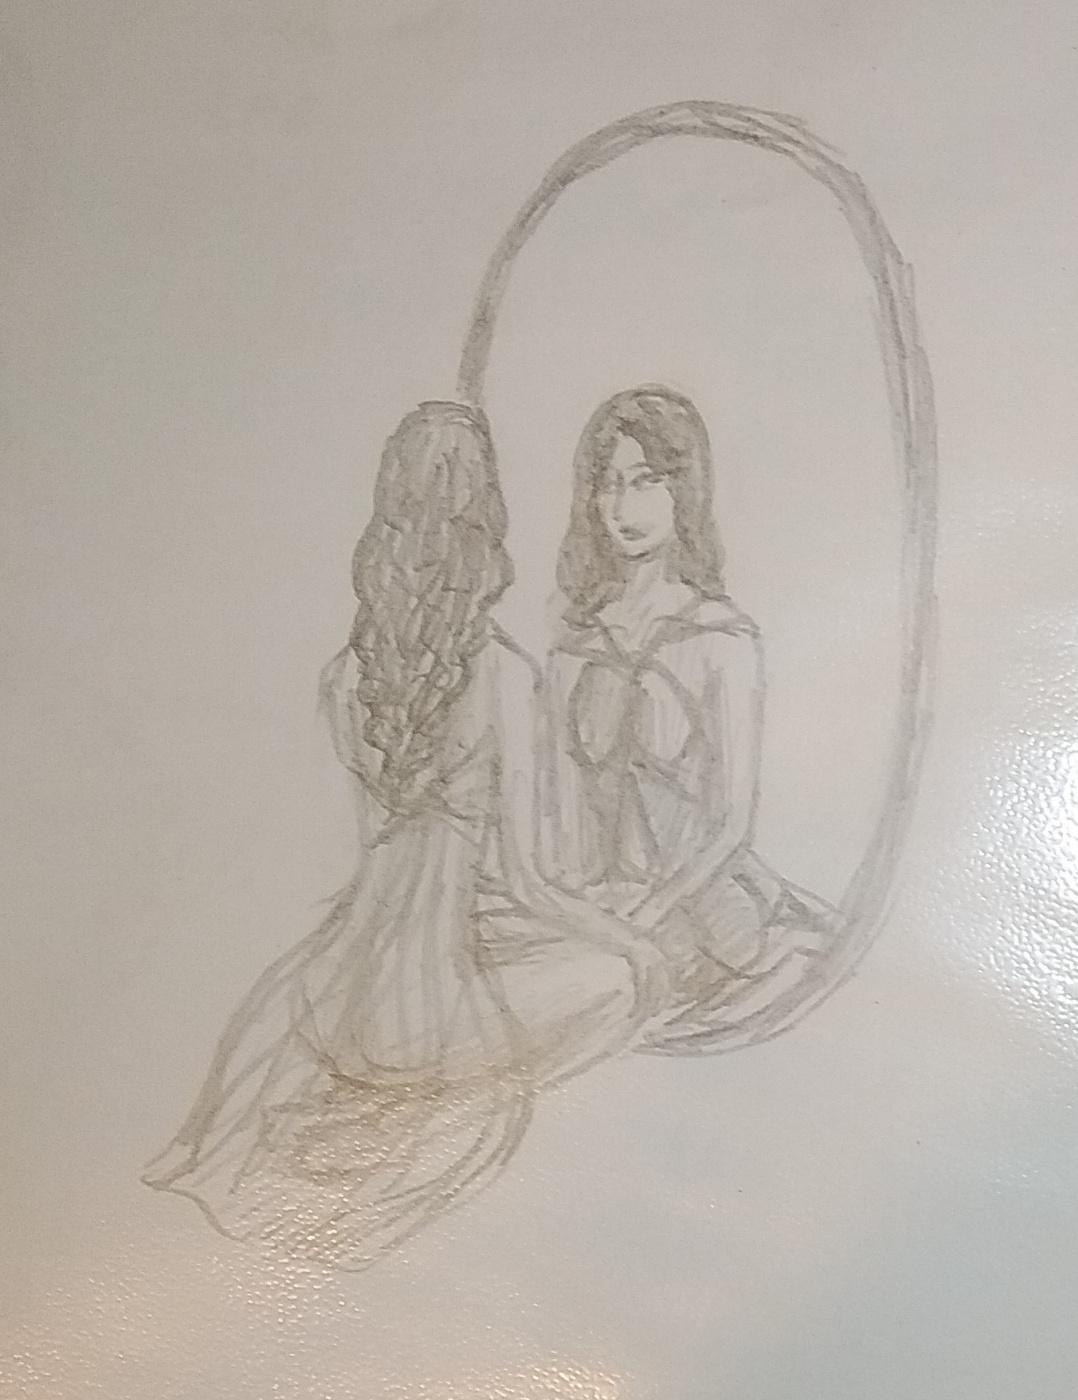 Zina Vladimirovna Parisva. In front of the mirror